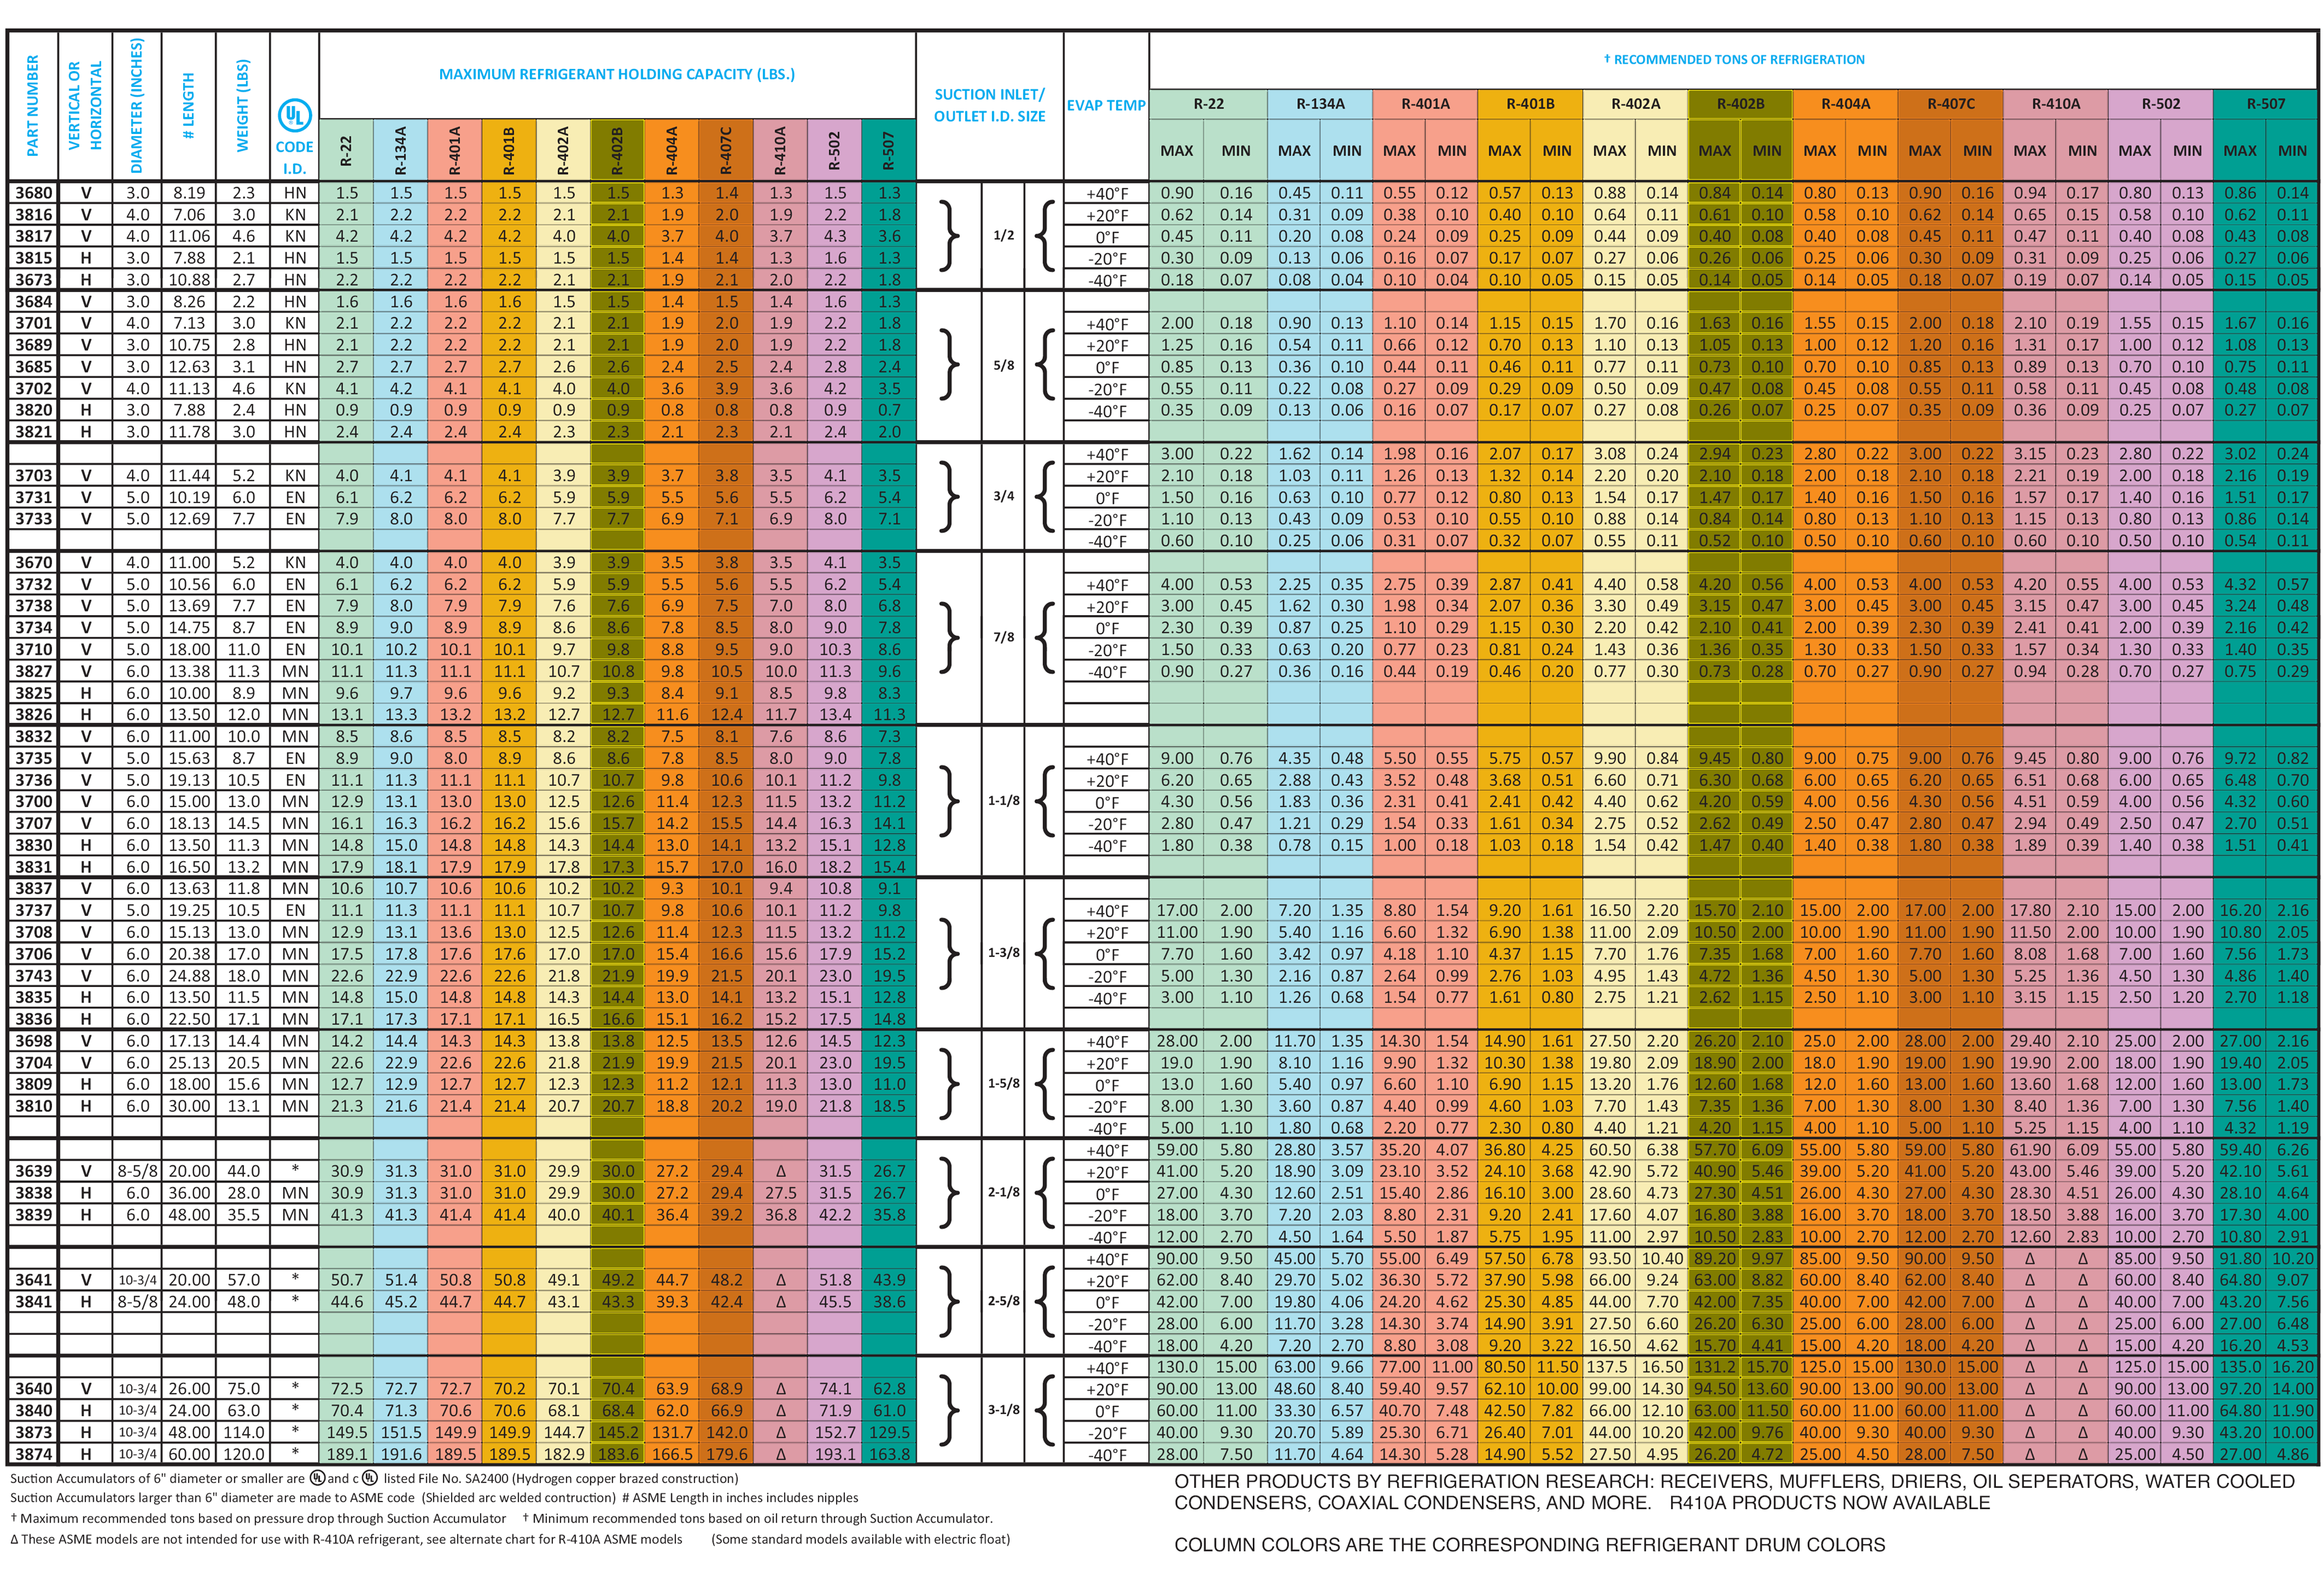 Suction Accumulators - Commercial Data